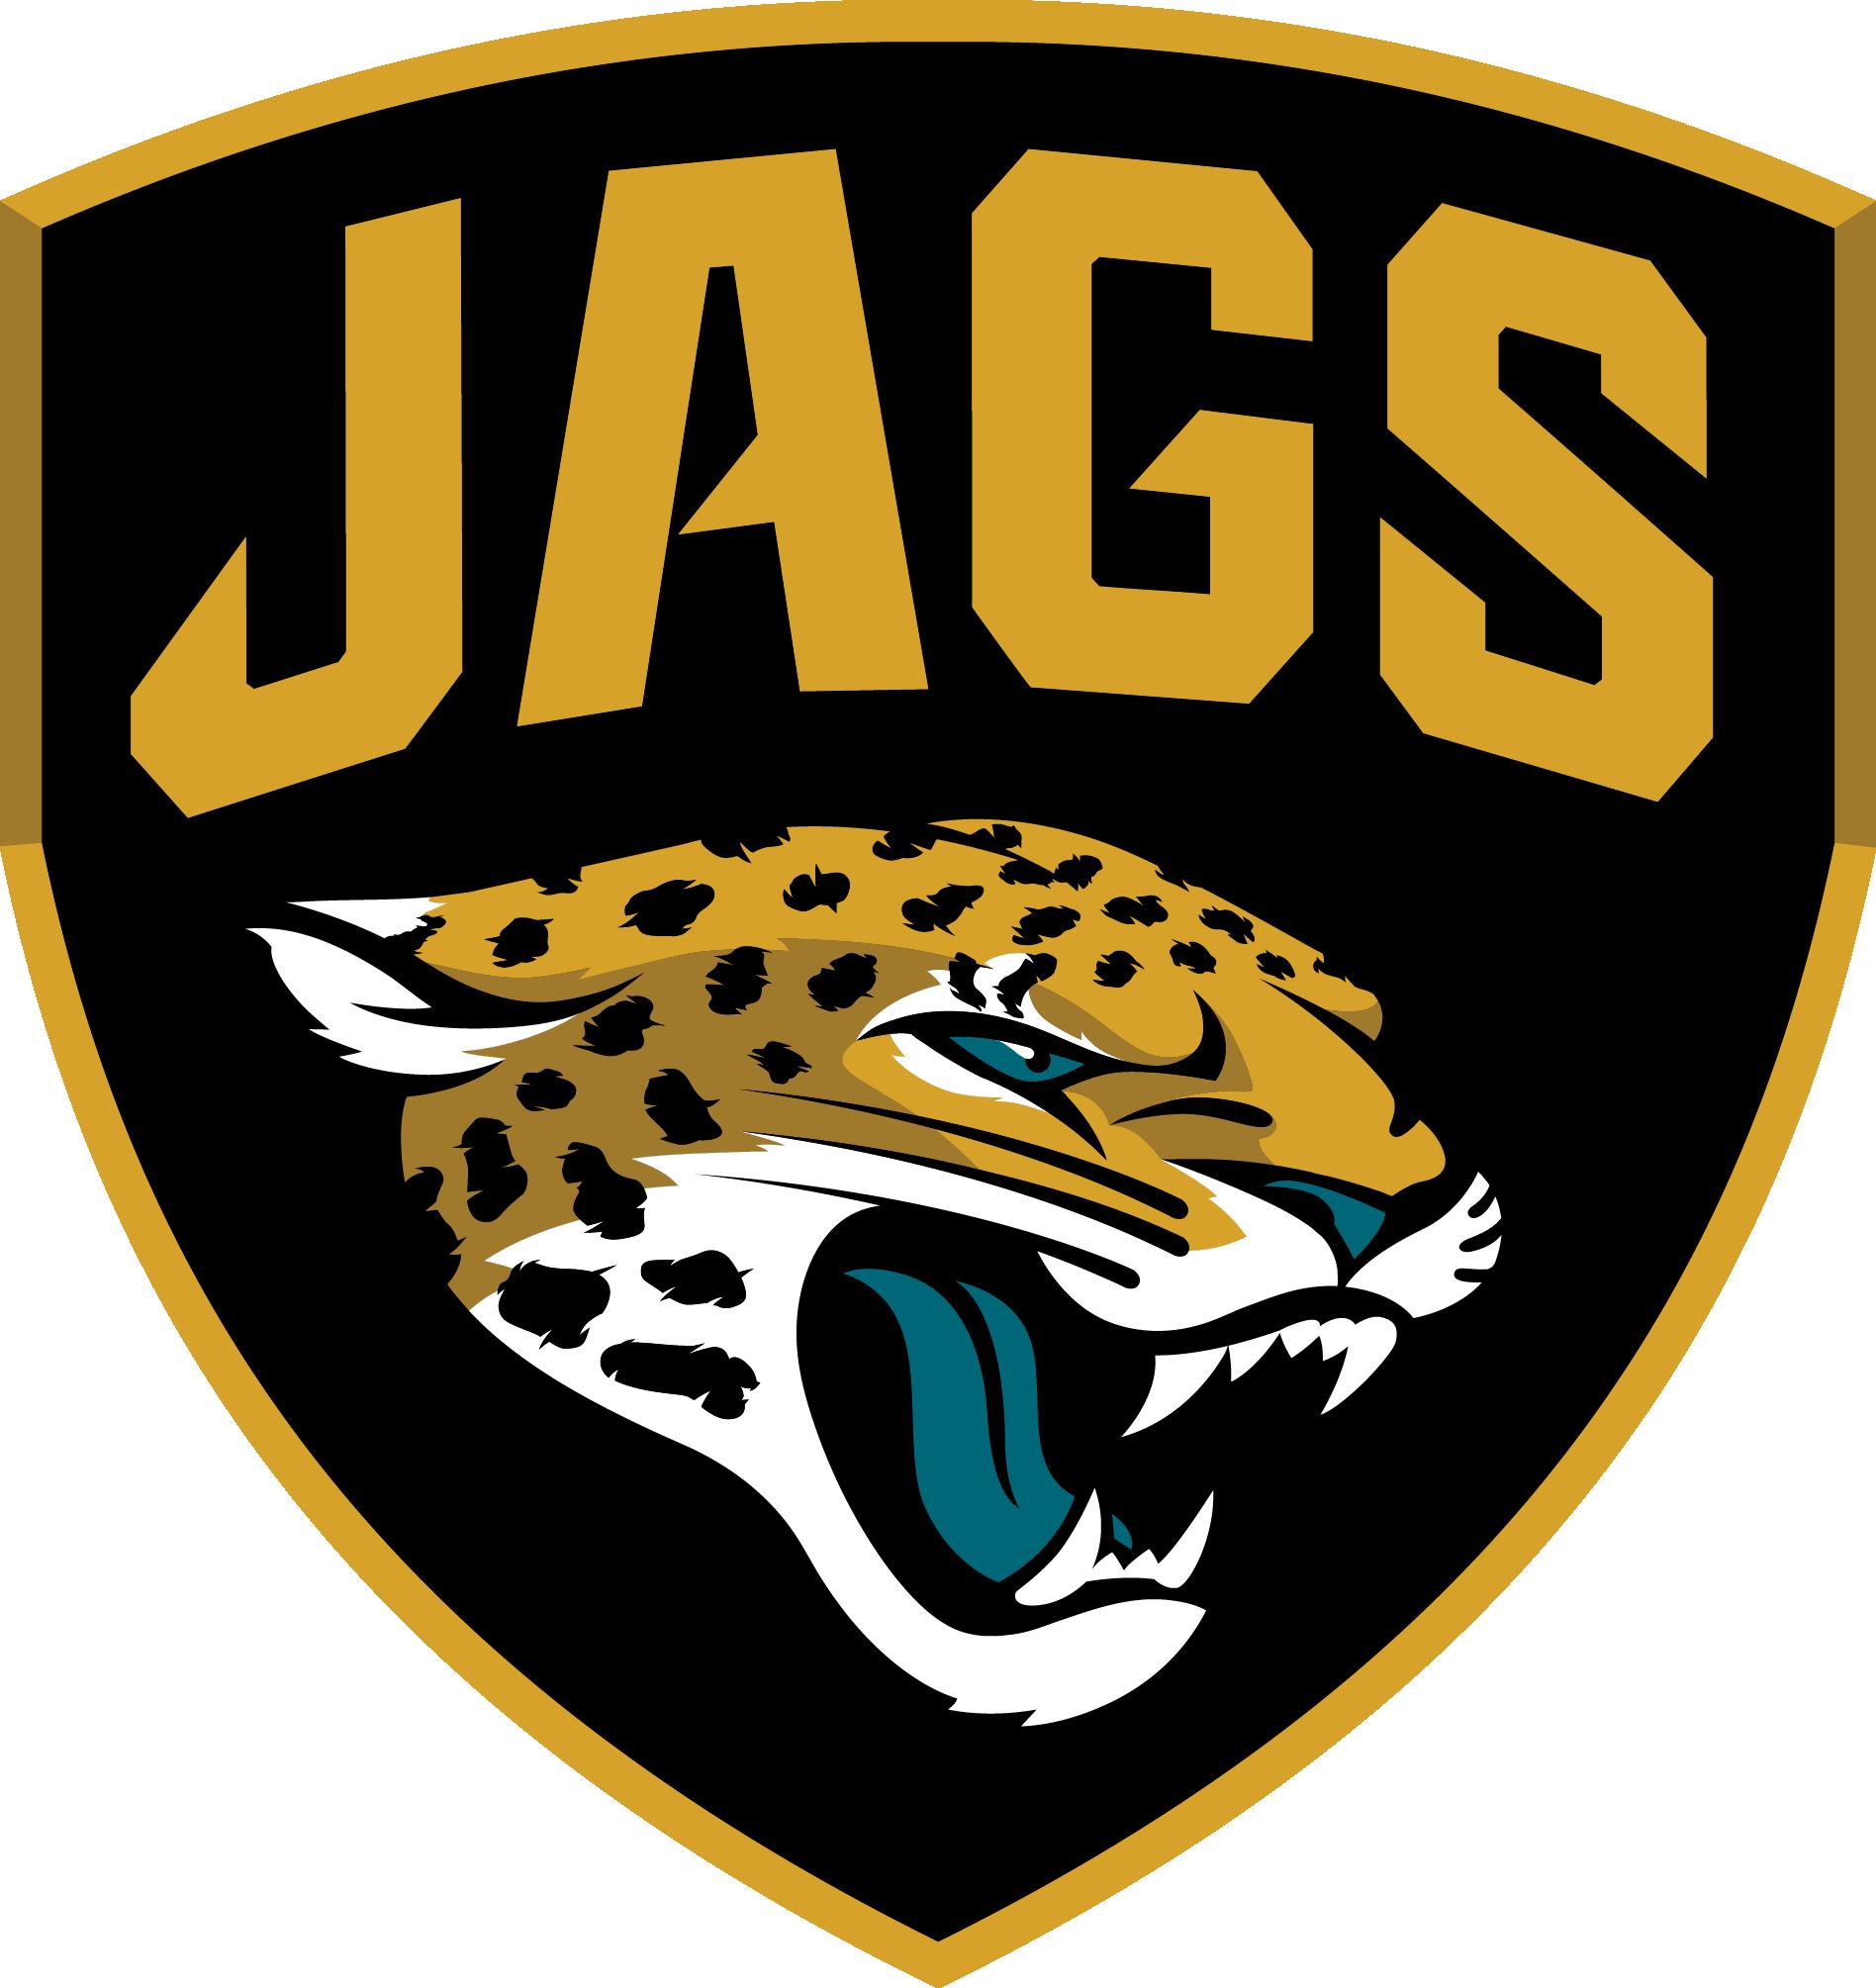 jacksonville jaguars Google Search Jacksonville